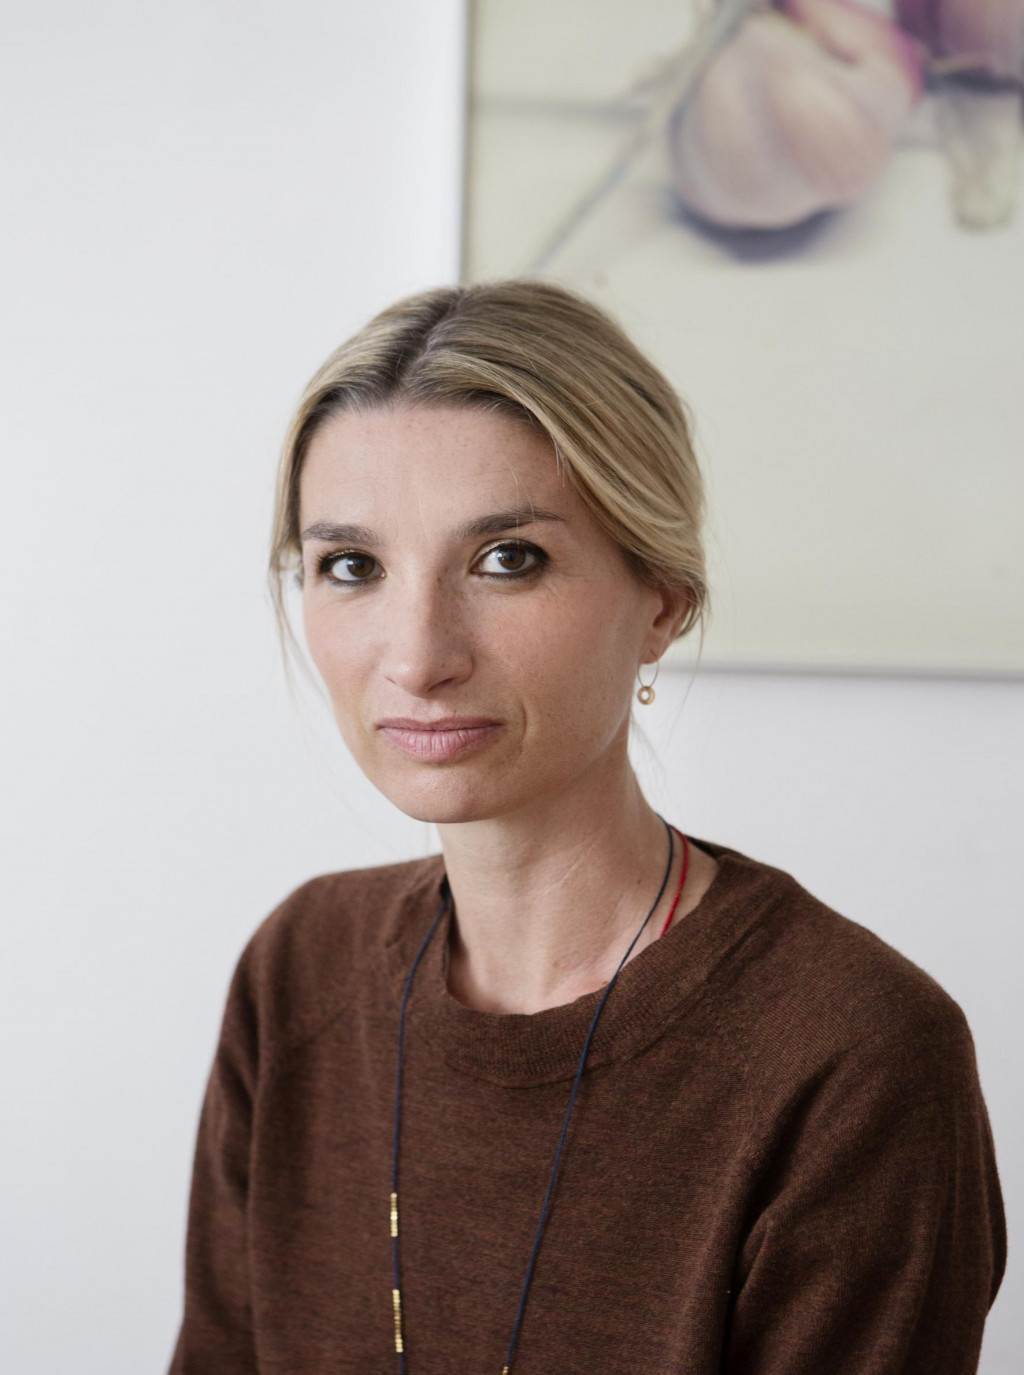 Tranny karlovac hrvatski klubovi zagreb seks, sex shop velika gorica chastity, seks kontakt oglasi